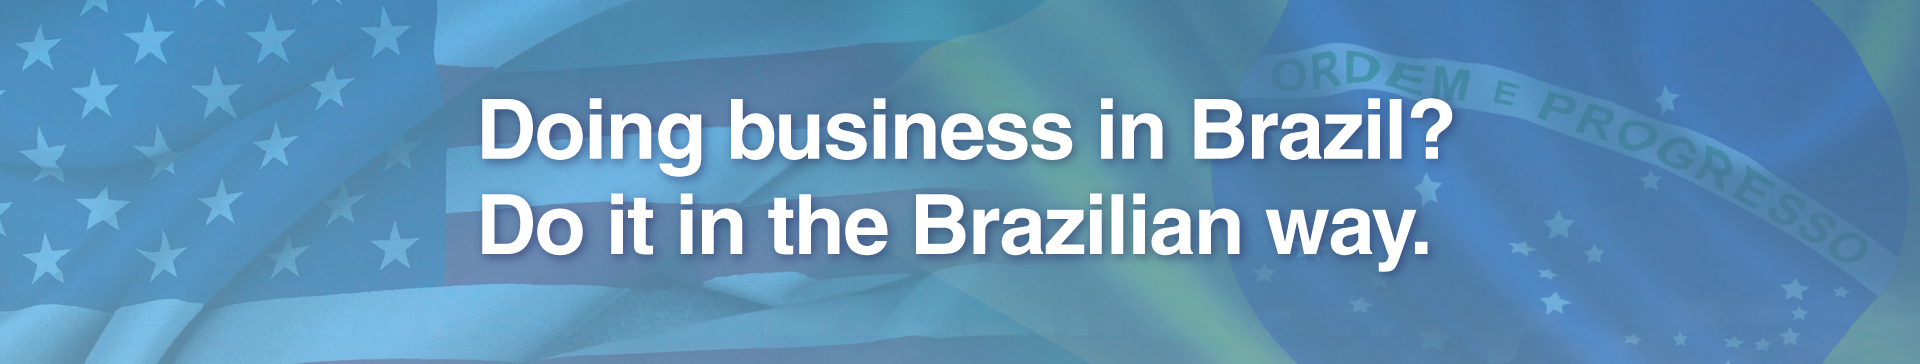 Doing business in Brazil? Do it in the Brazilian way.